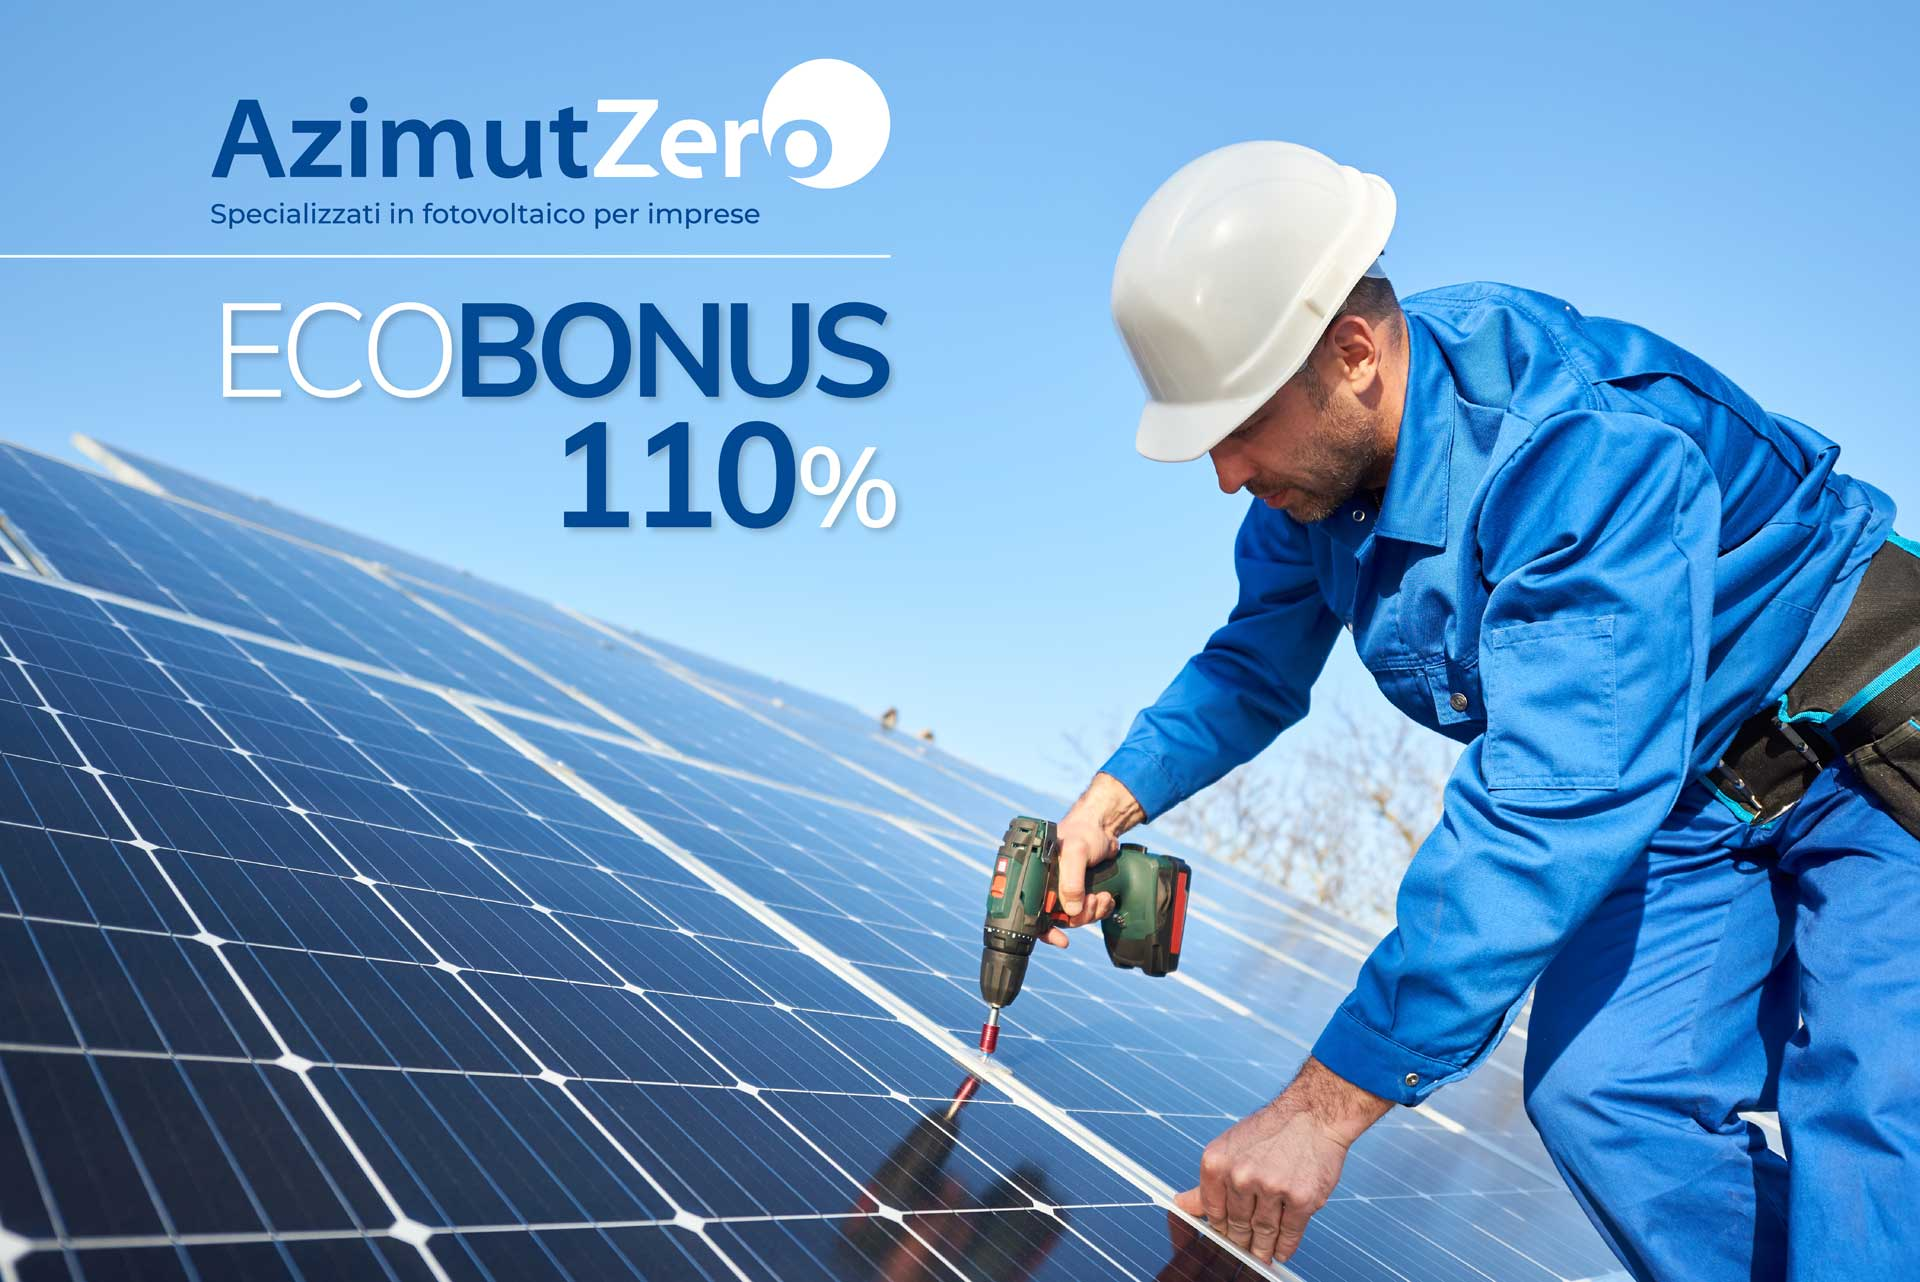 L'ECOBONUS al 110% per il fotovoltaico